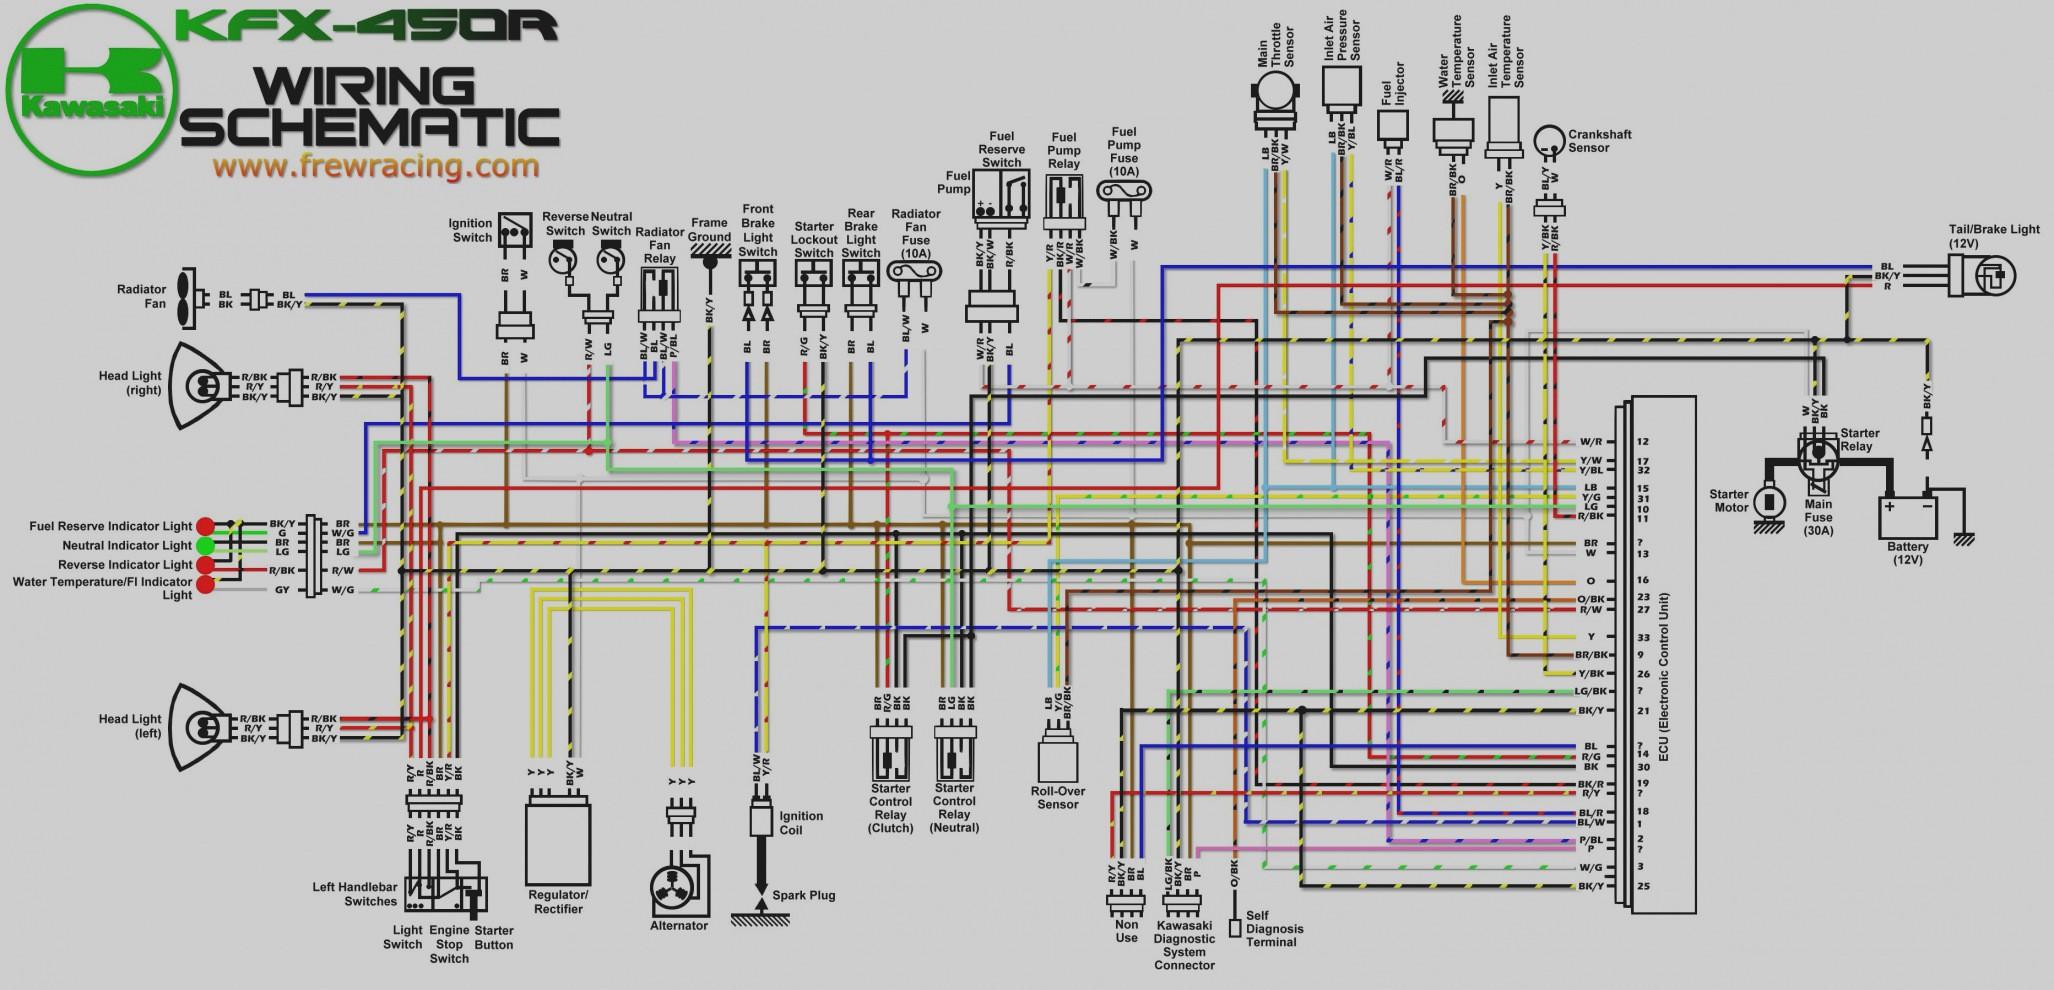 04 Yfz 450 Wiring Diagram | Wiring Diagram Yfz Wire Harness on